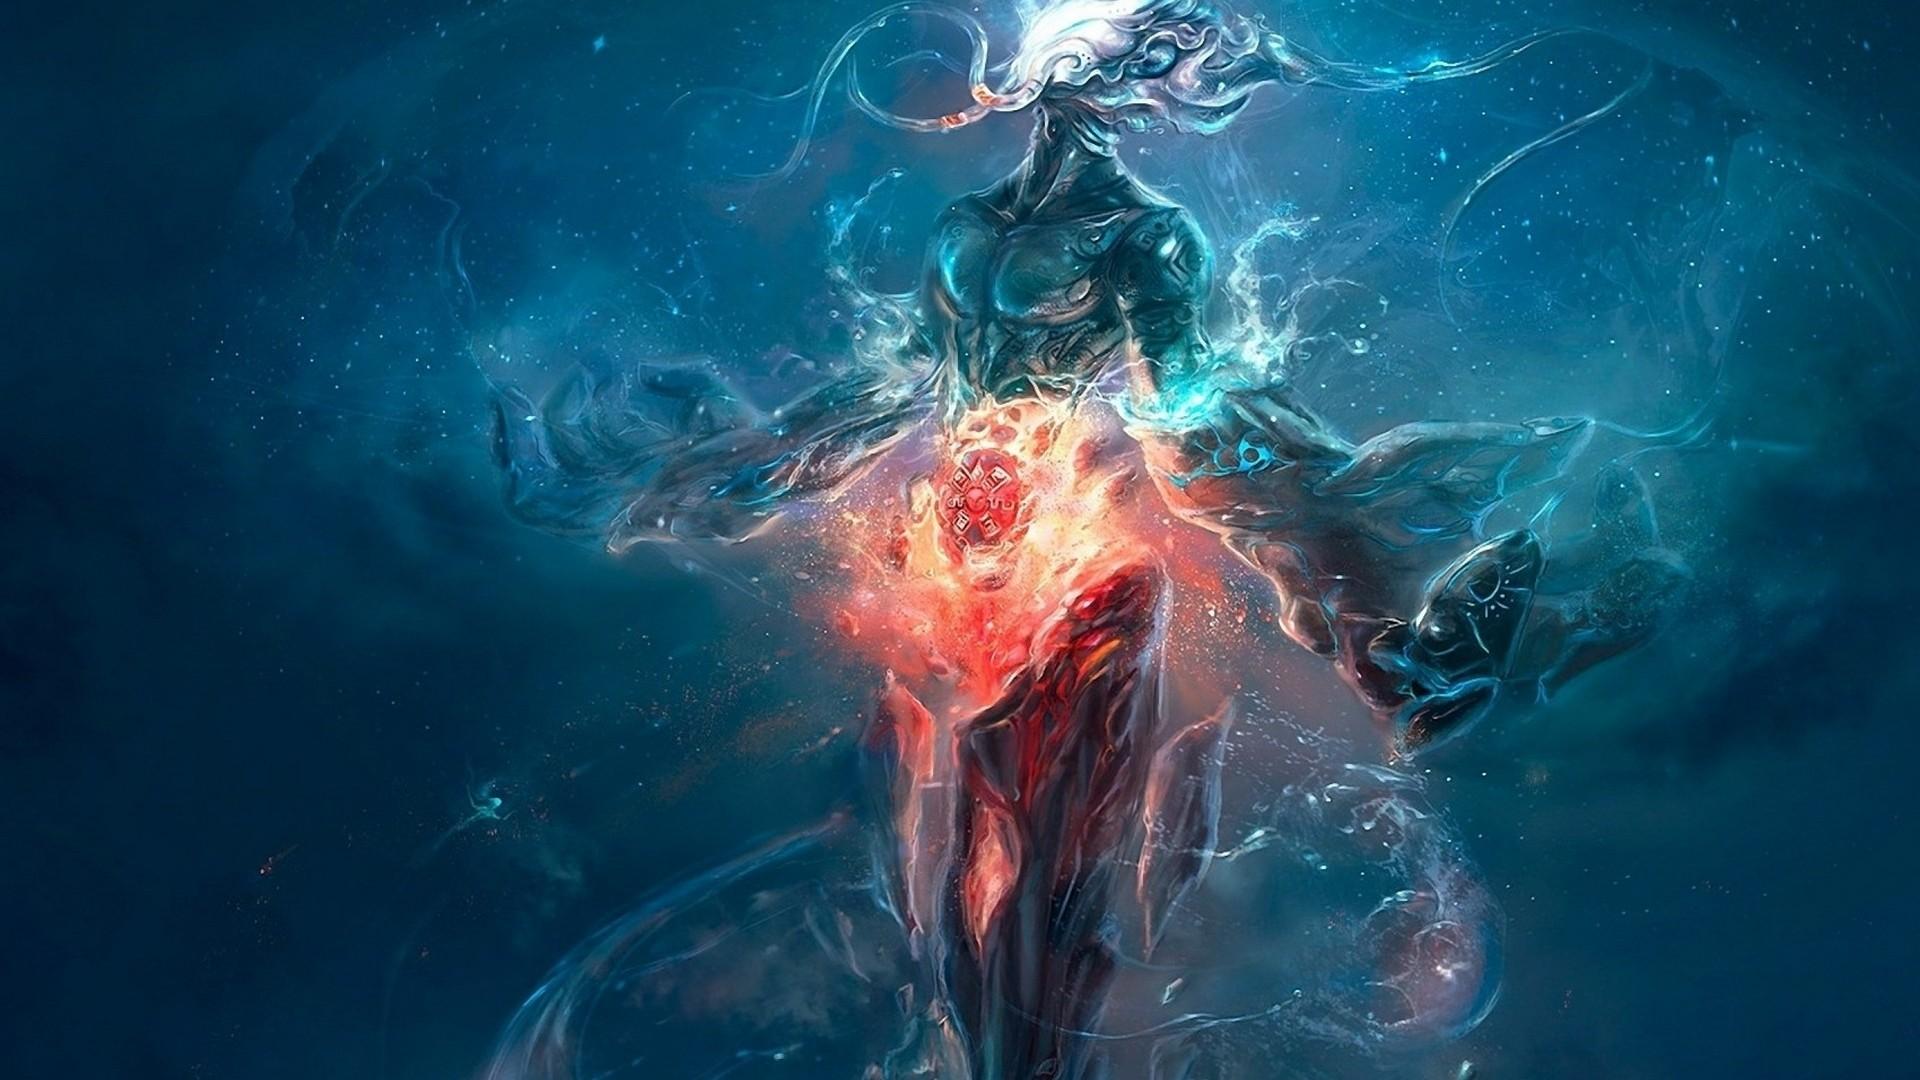 Water Falling Wallpaper Desktop Underwater Entities Mystery Of The Iniquity